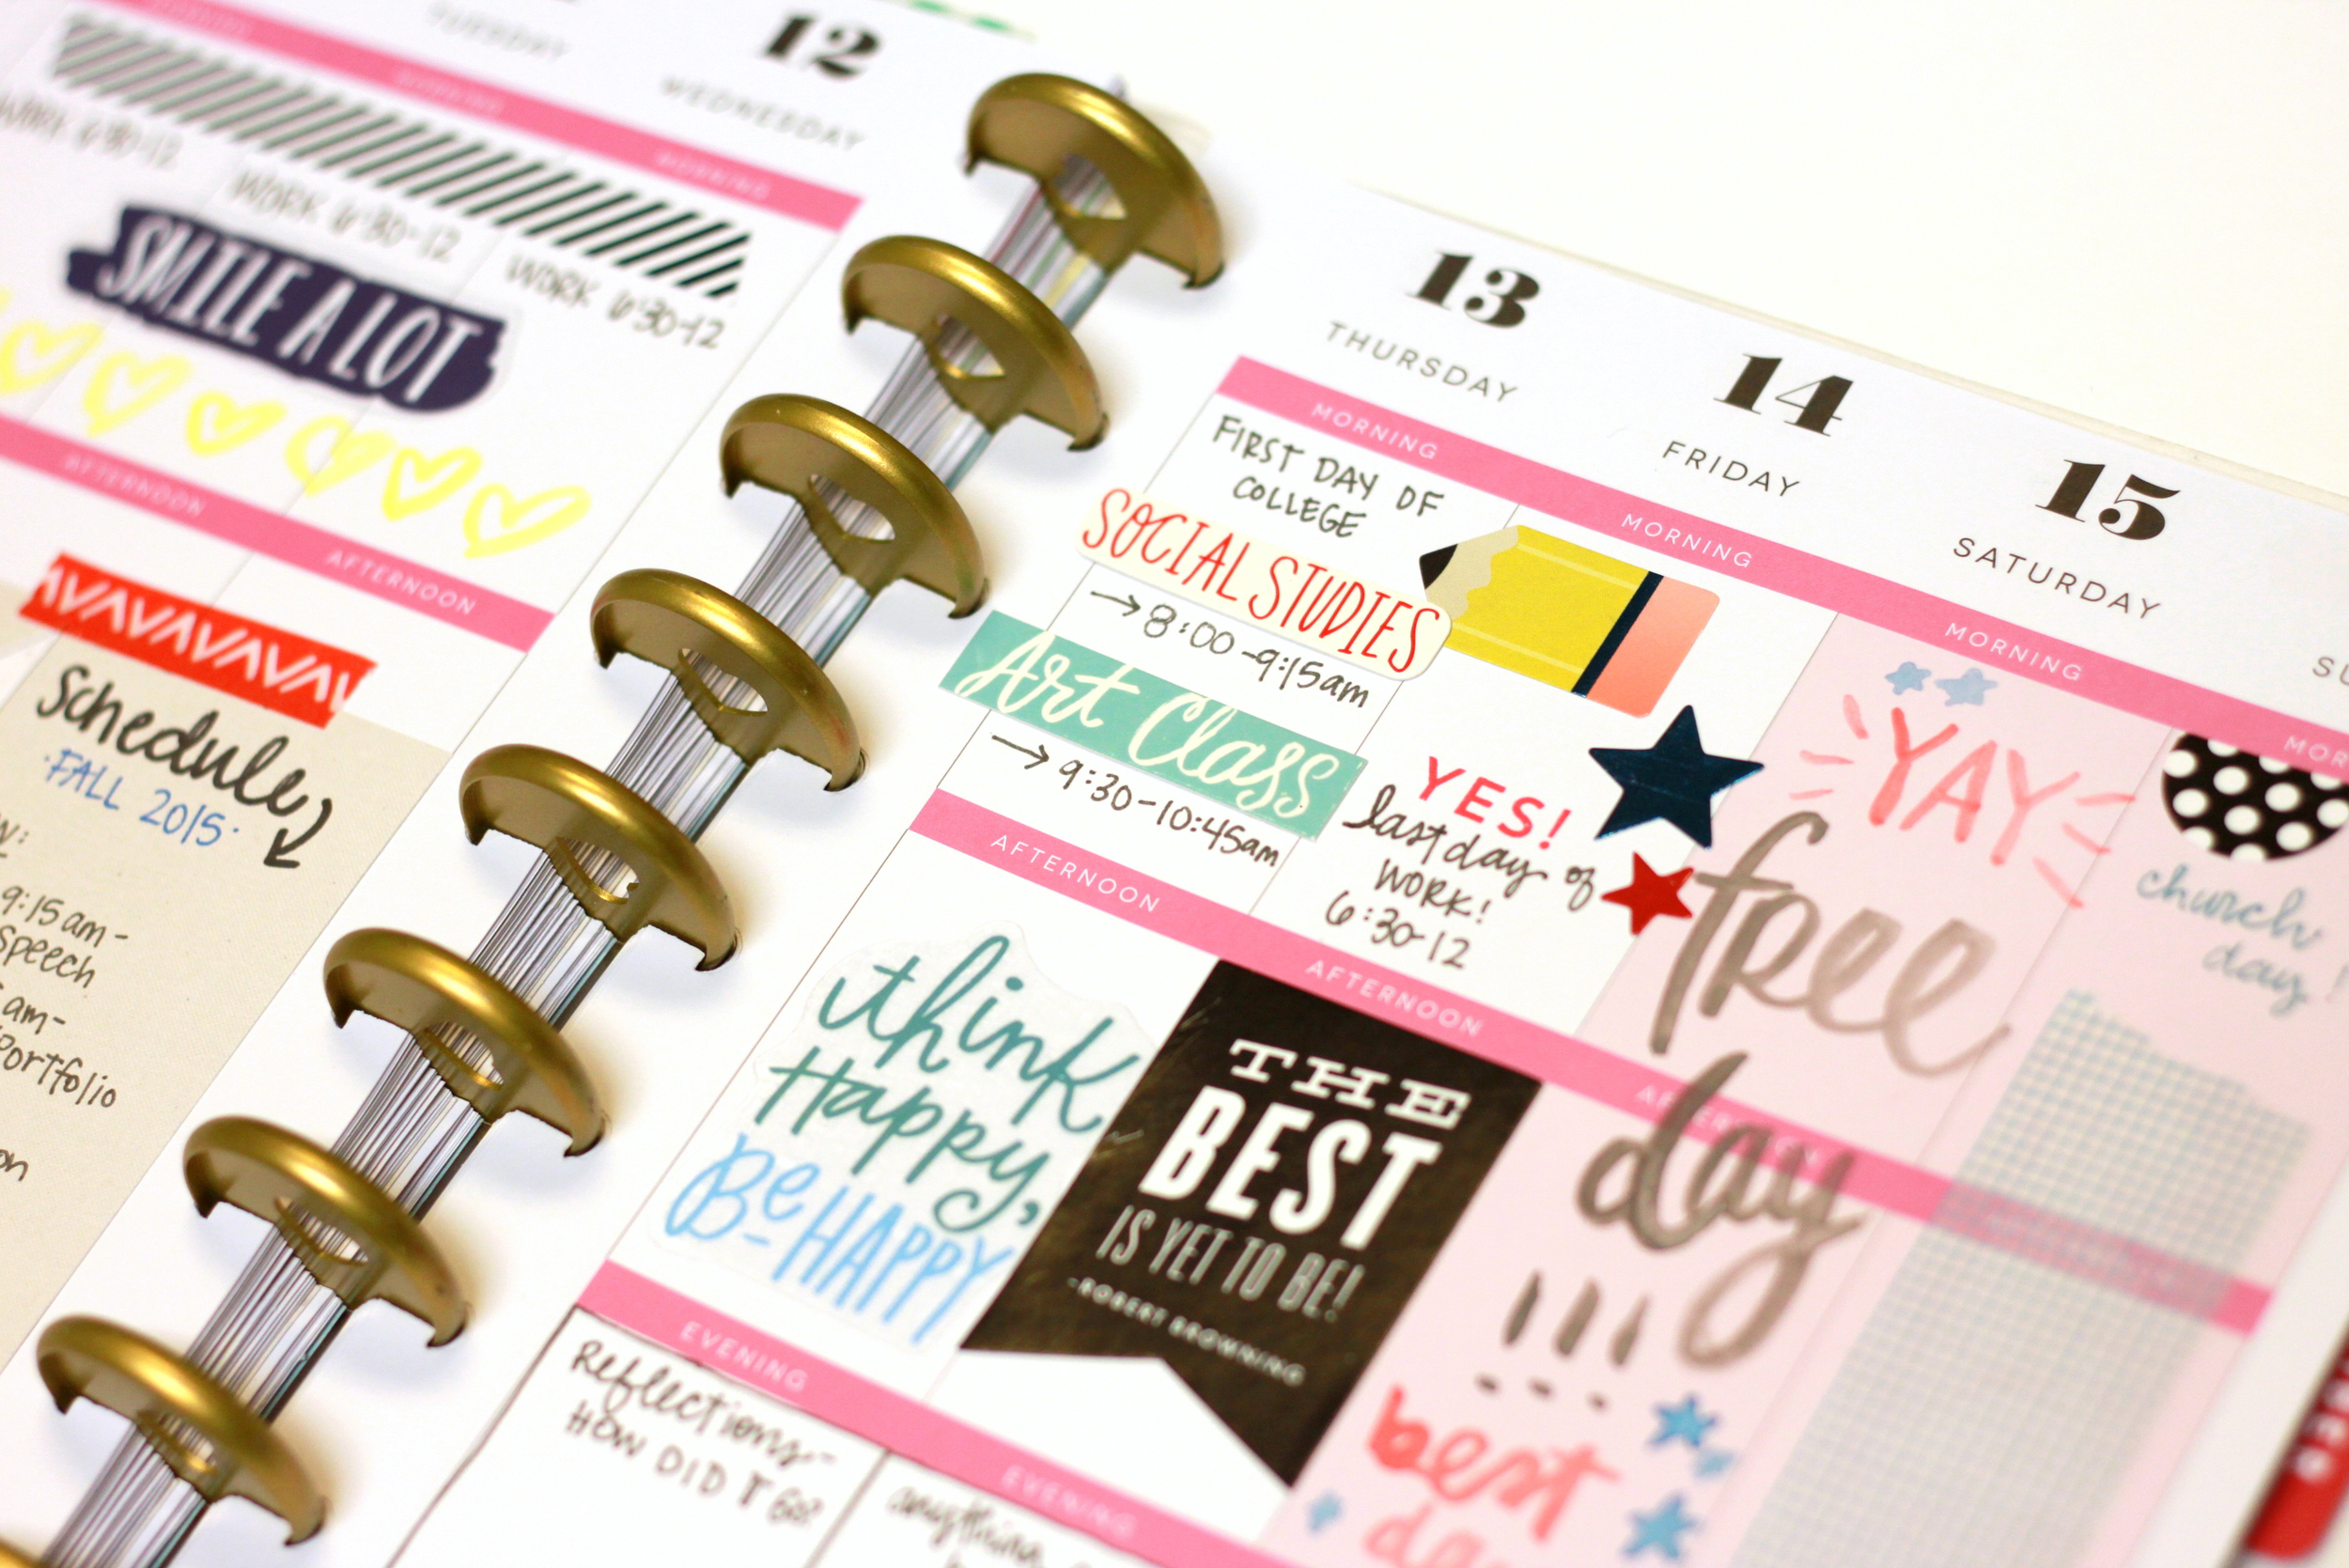 Fall 2015 semester in The Happy Planner™ of mambi Design Team member Heather Adams | me & my BIG ideas